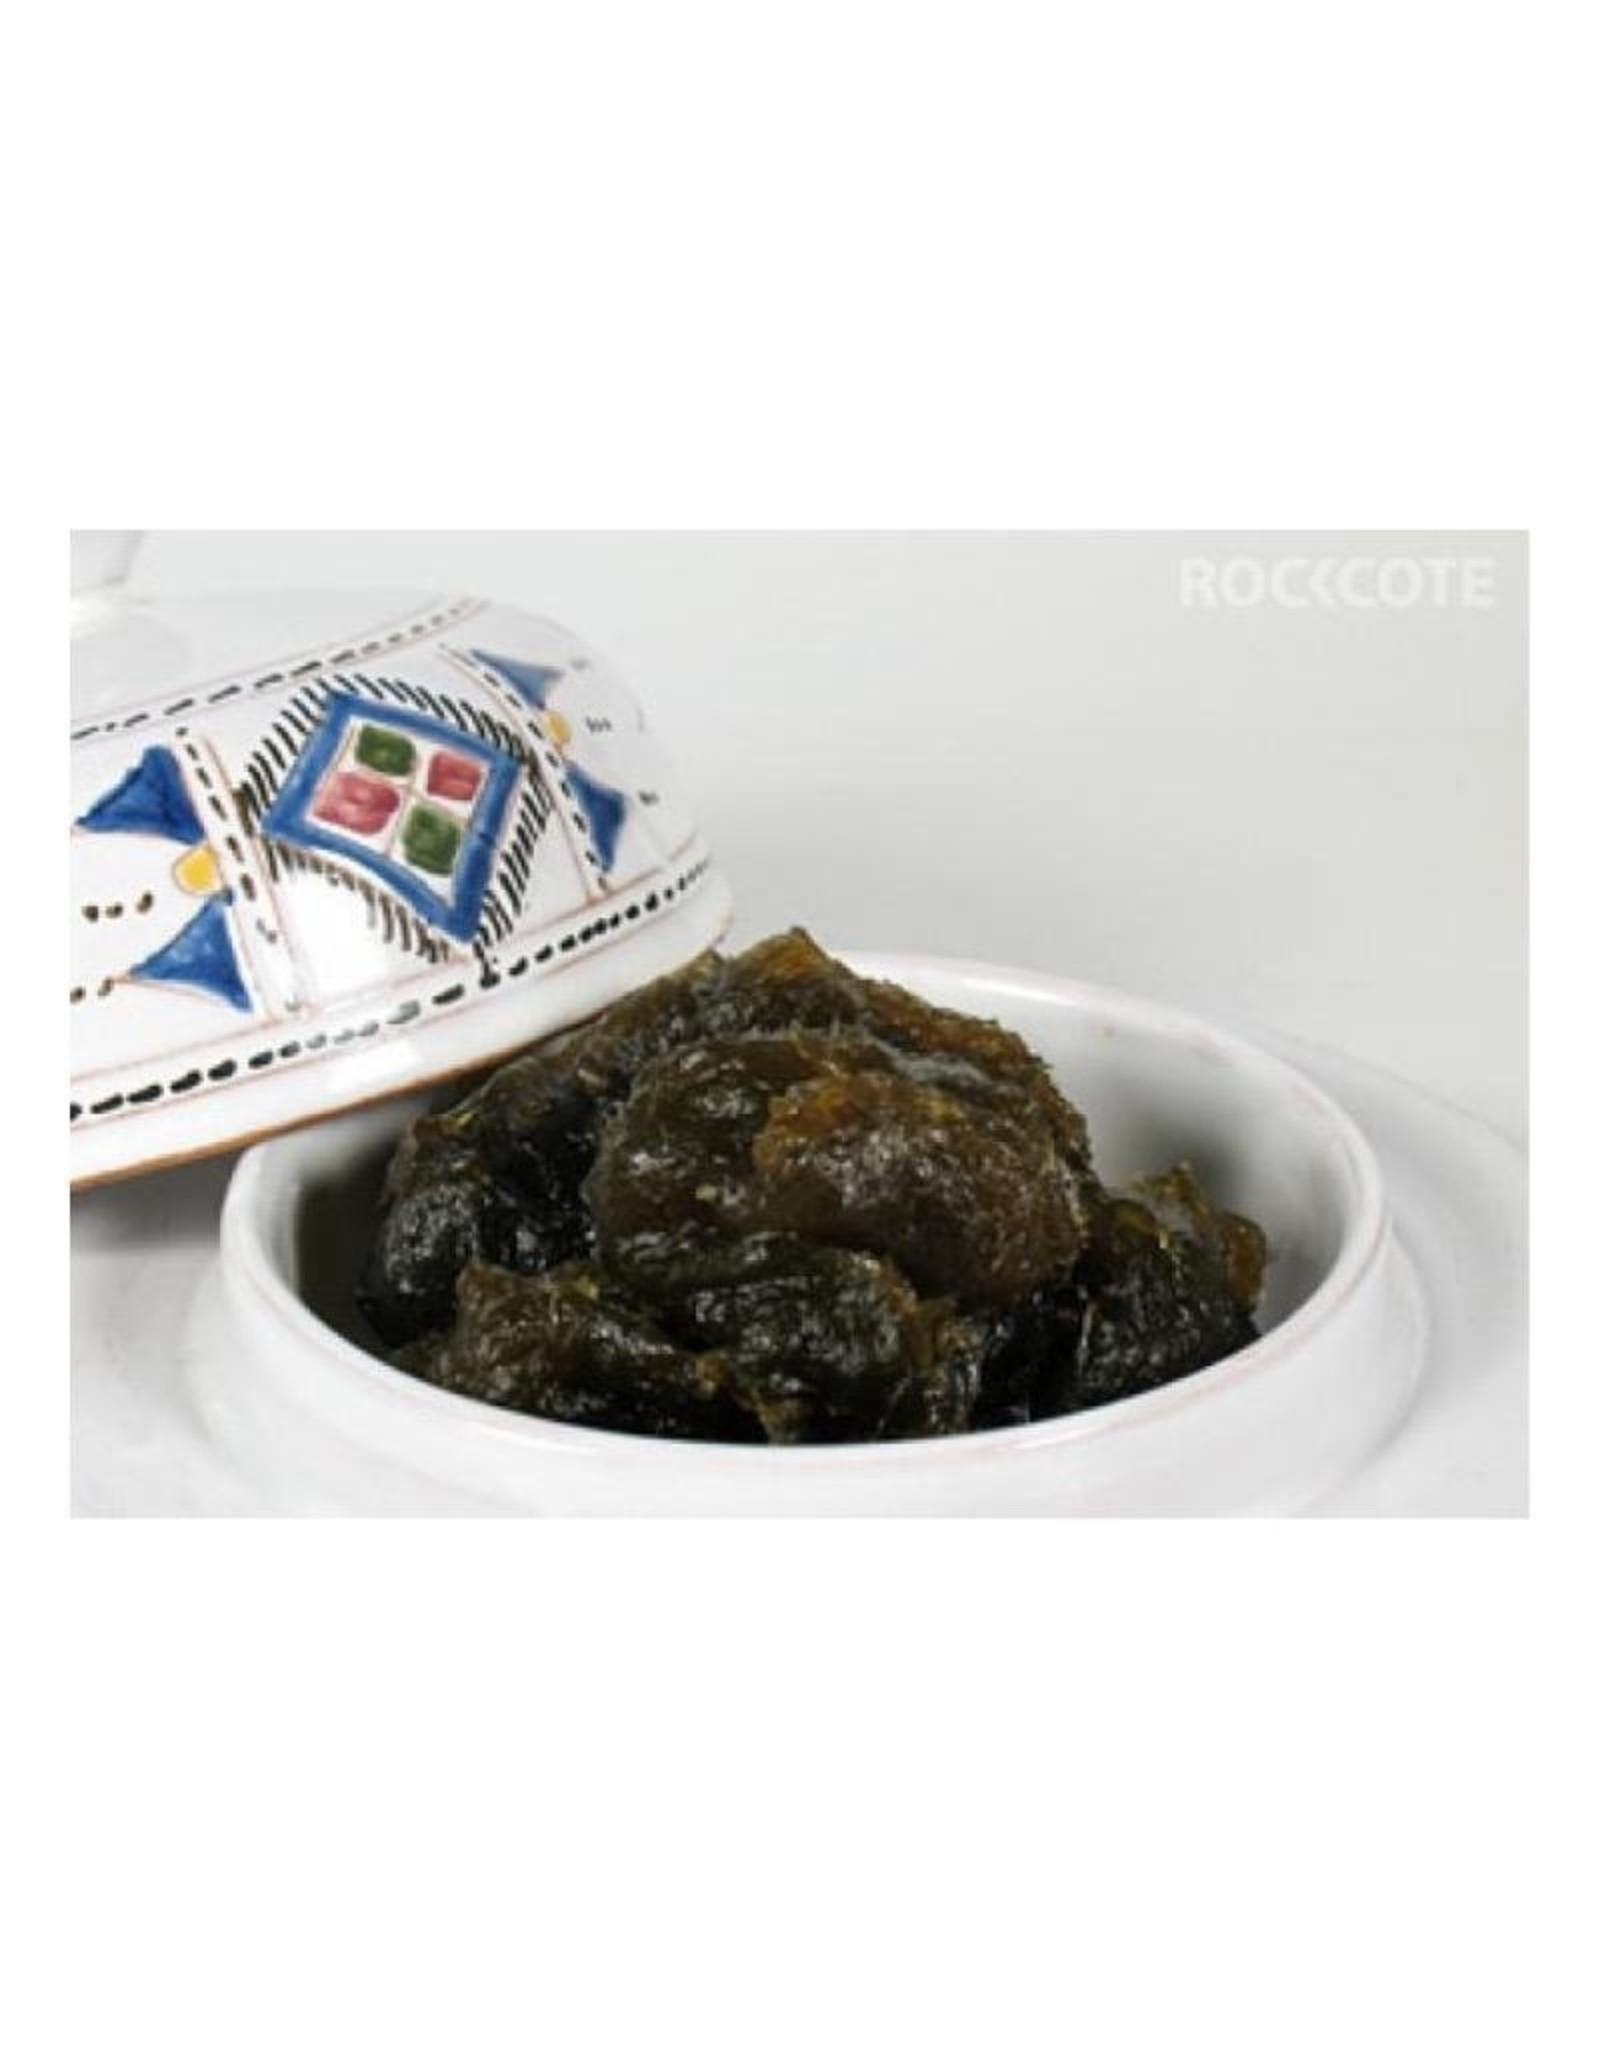 ROCKCOTE Black Soap 200gms